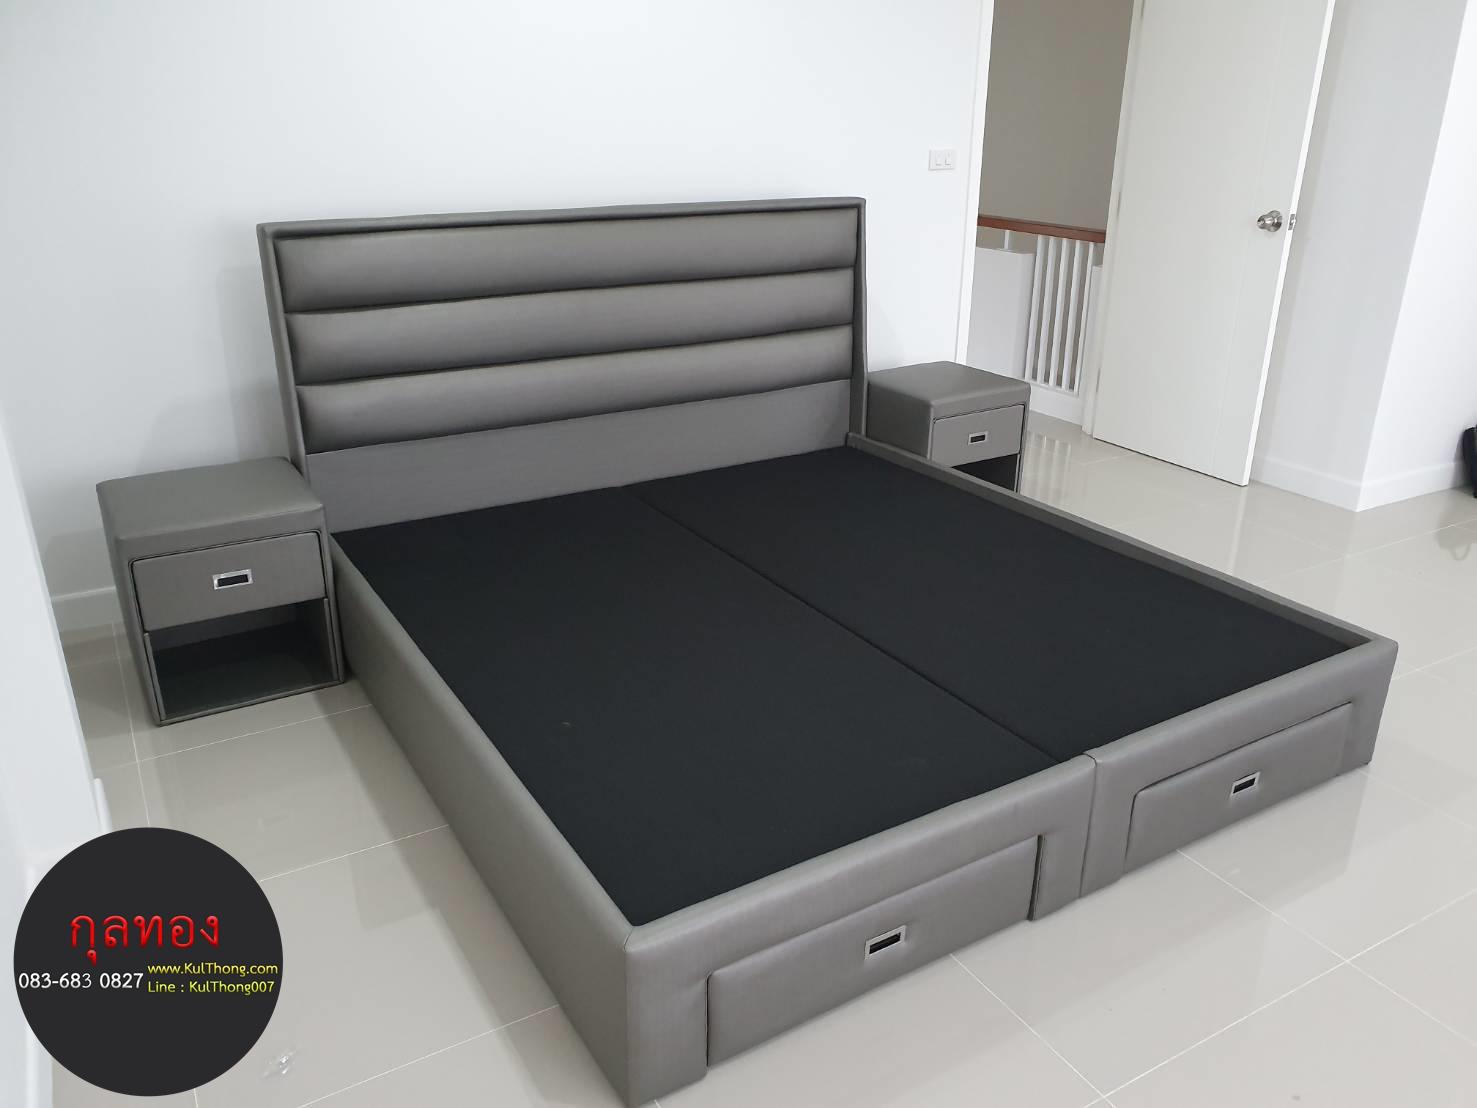 Bedside Cabinet ตู้ข้างเตียง